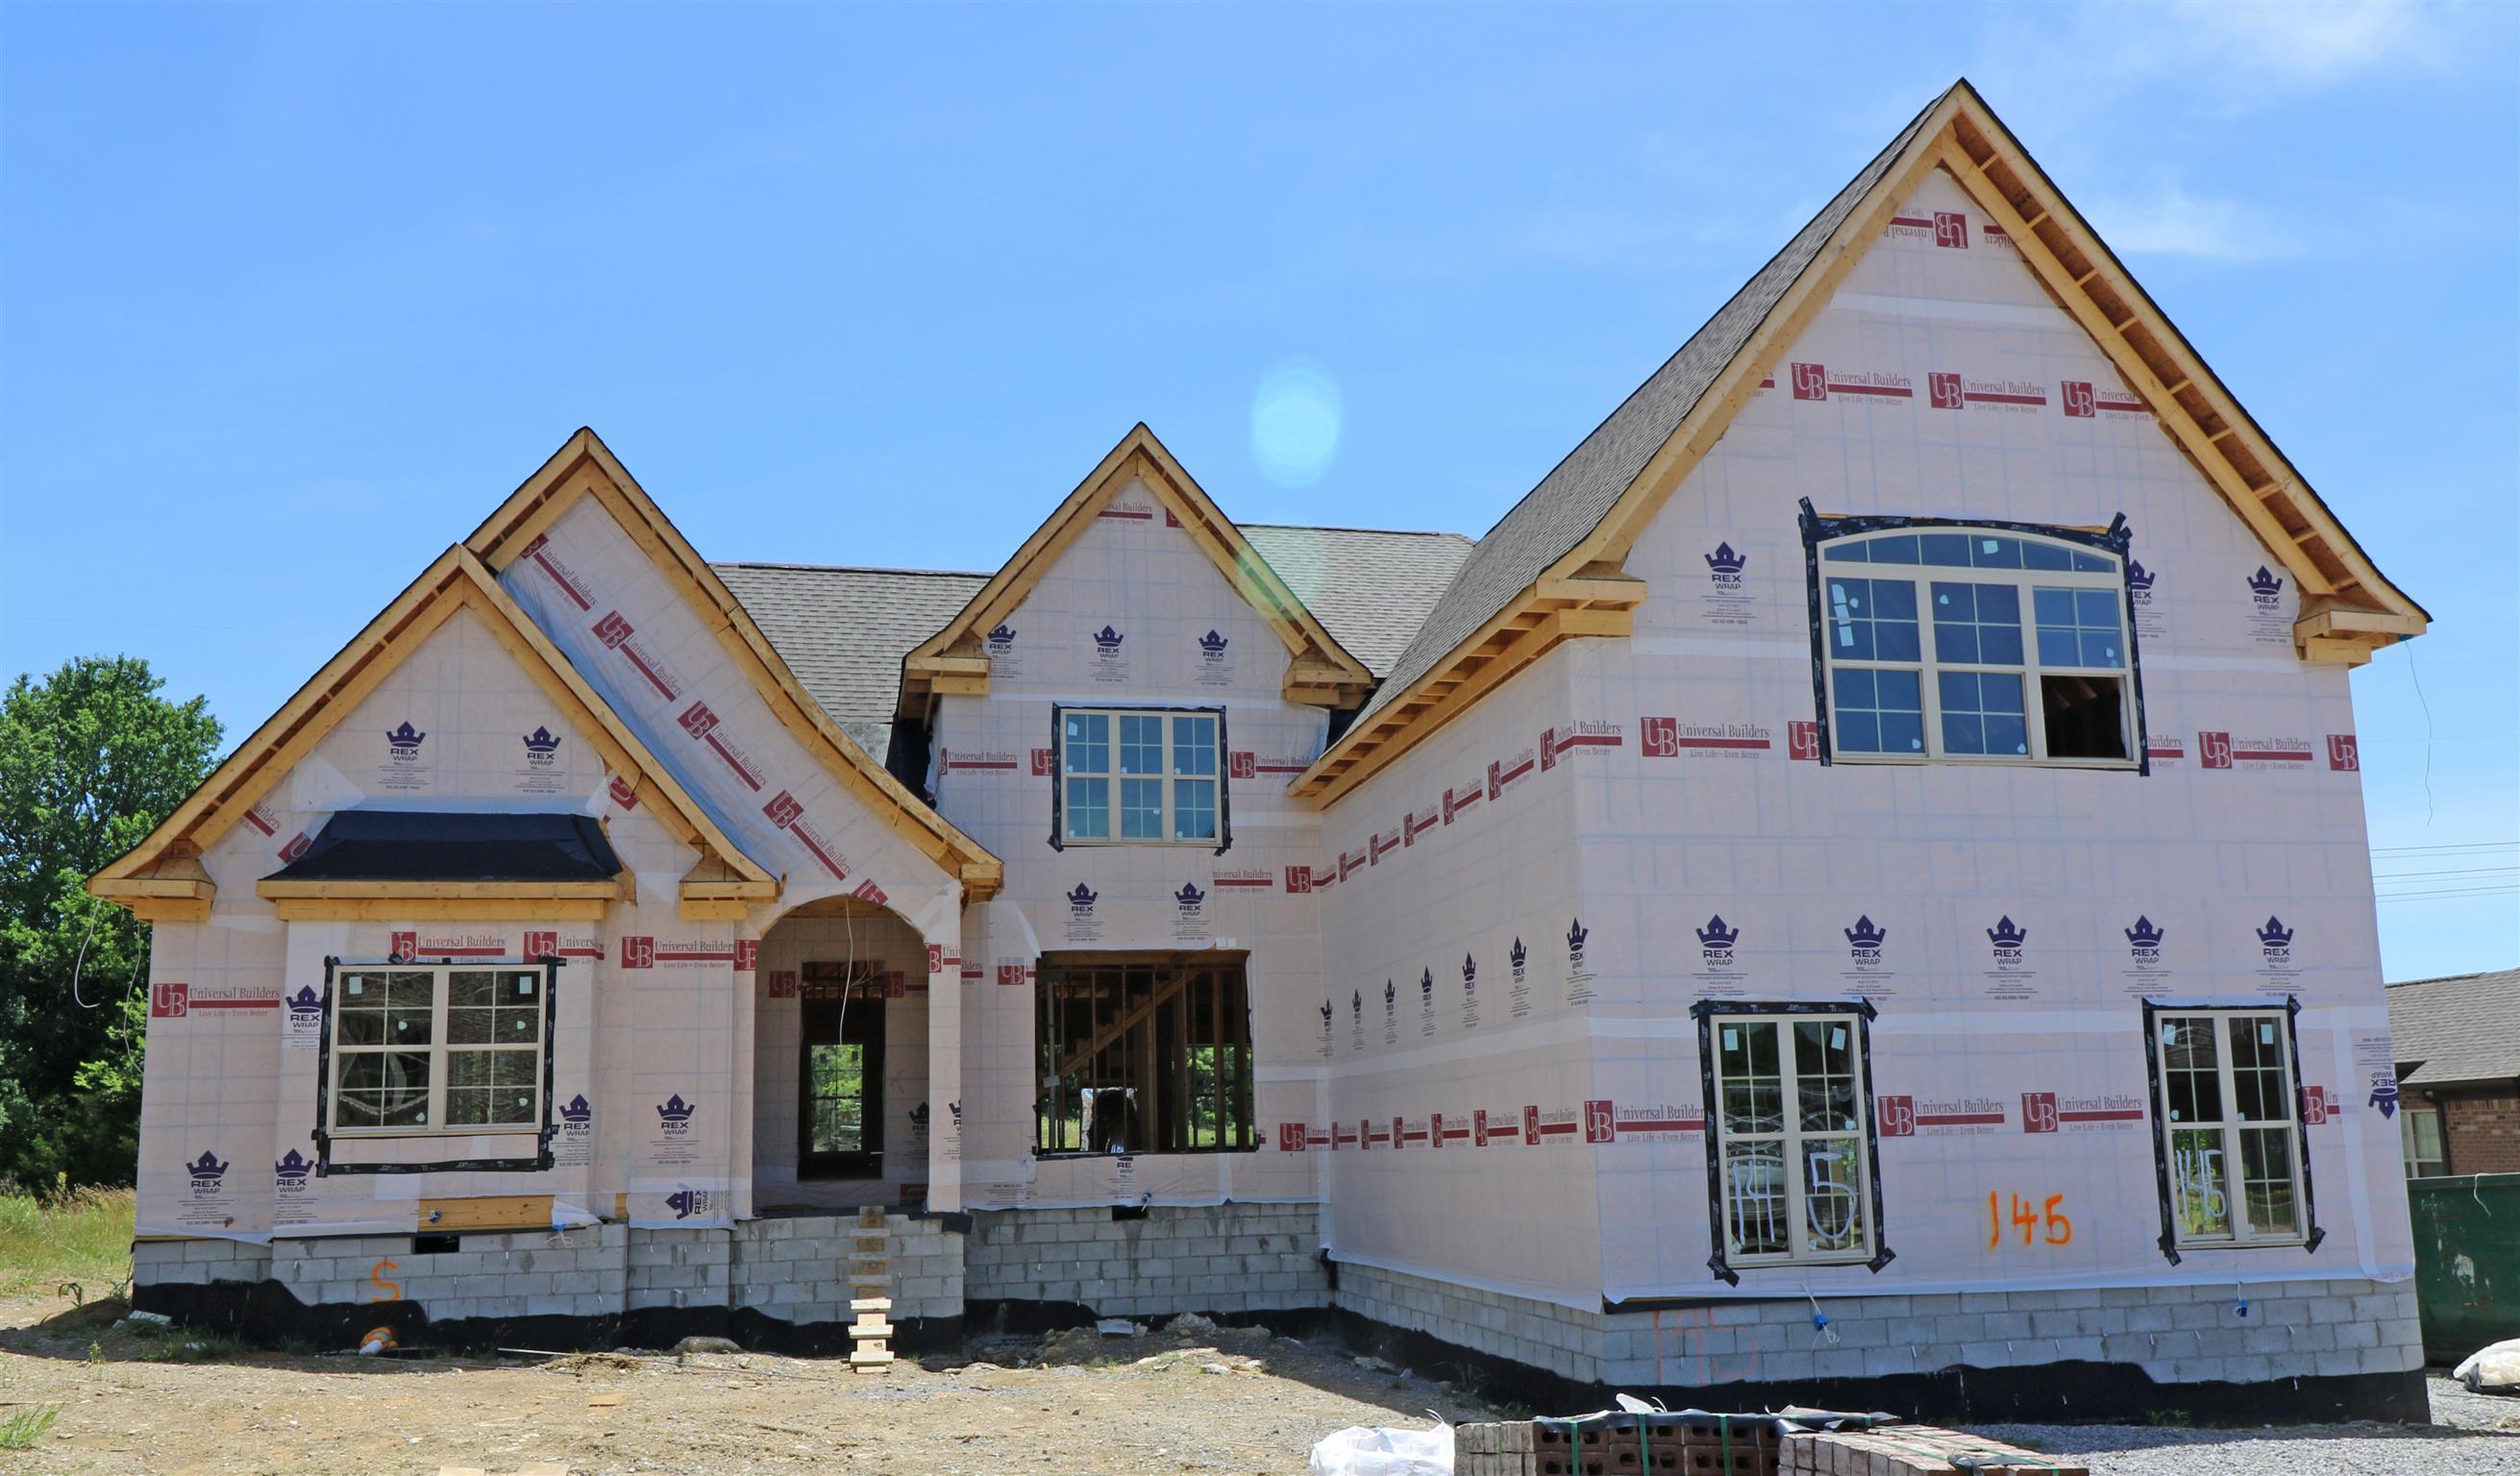 1705 Amhurst Point, Mount Juliet, TN 37122 - Mount Juliet, TN real estate listing